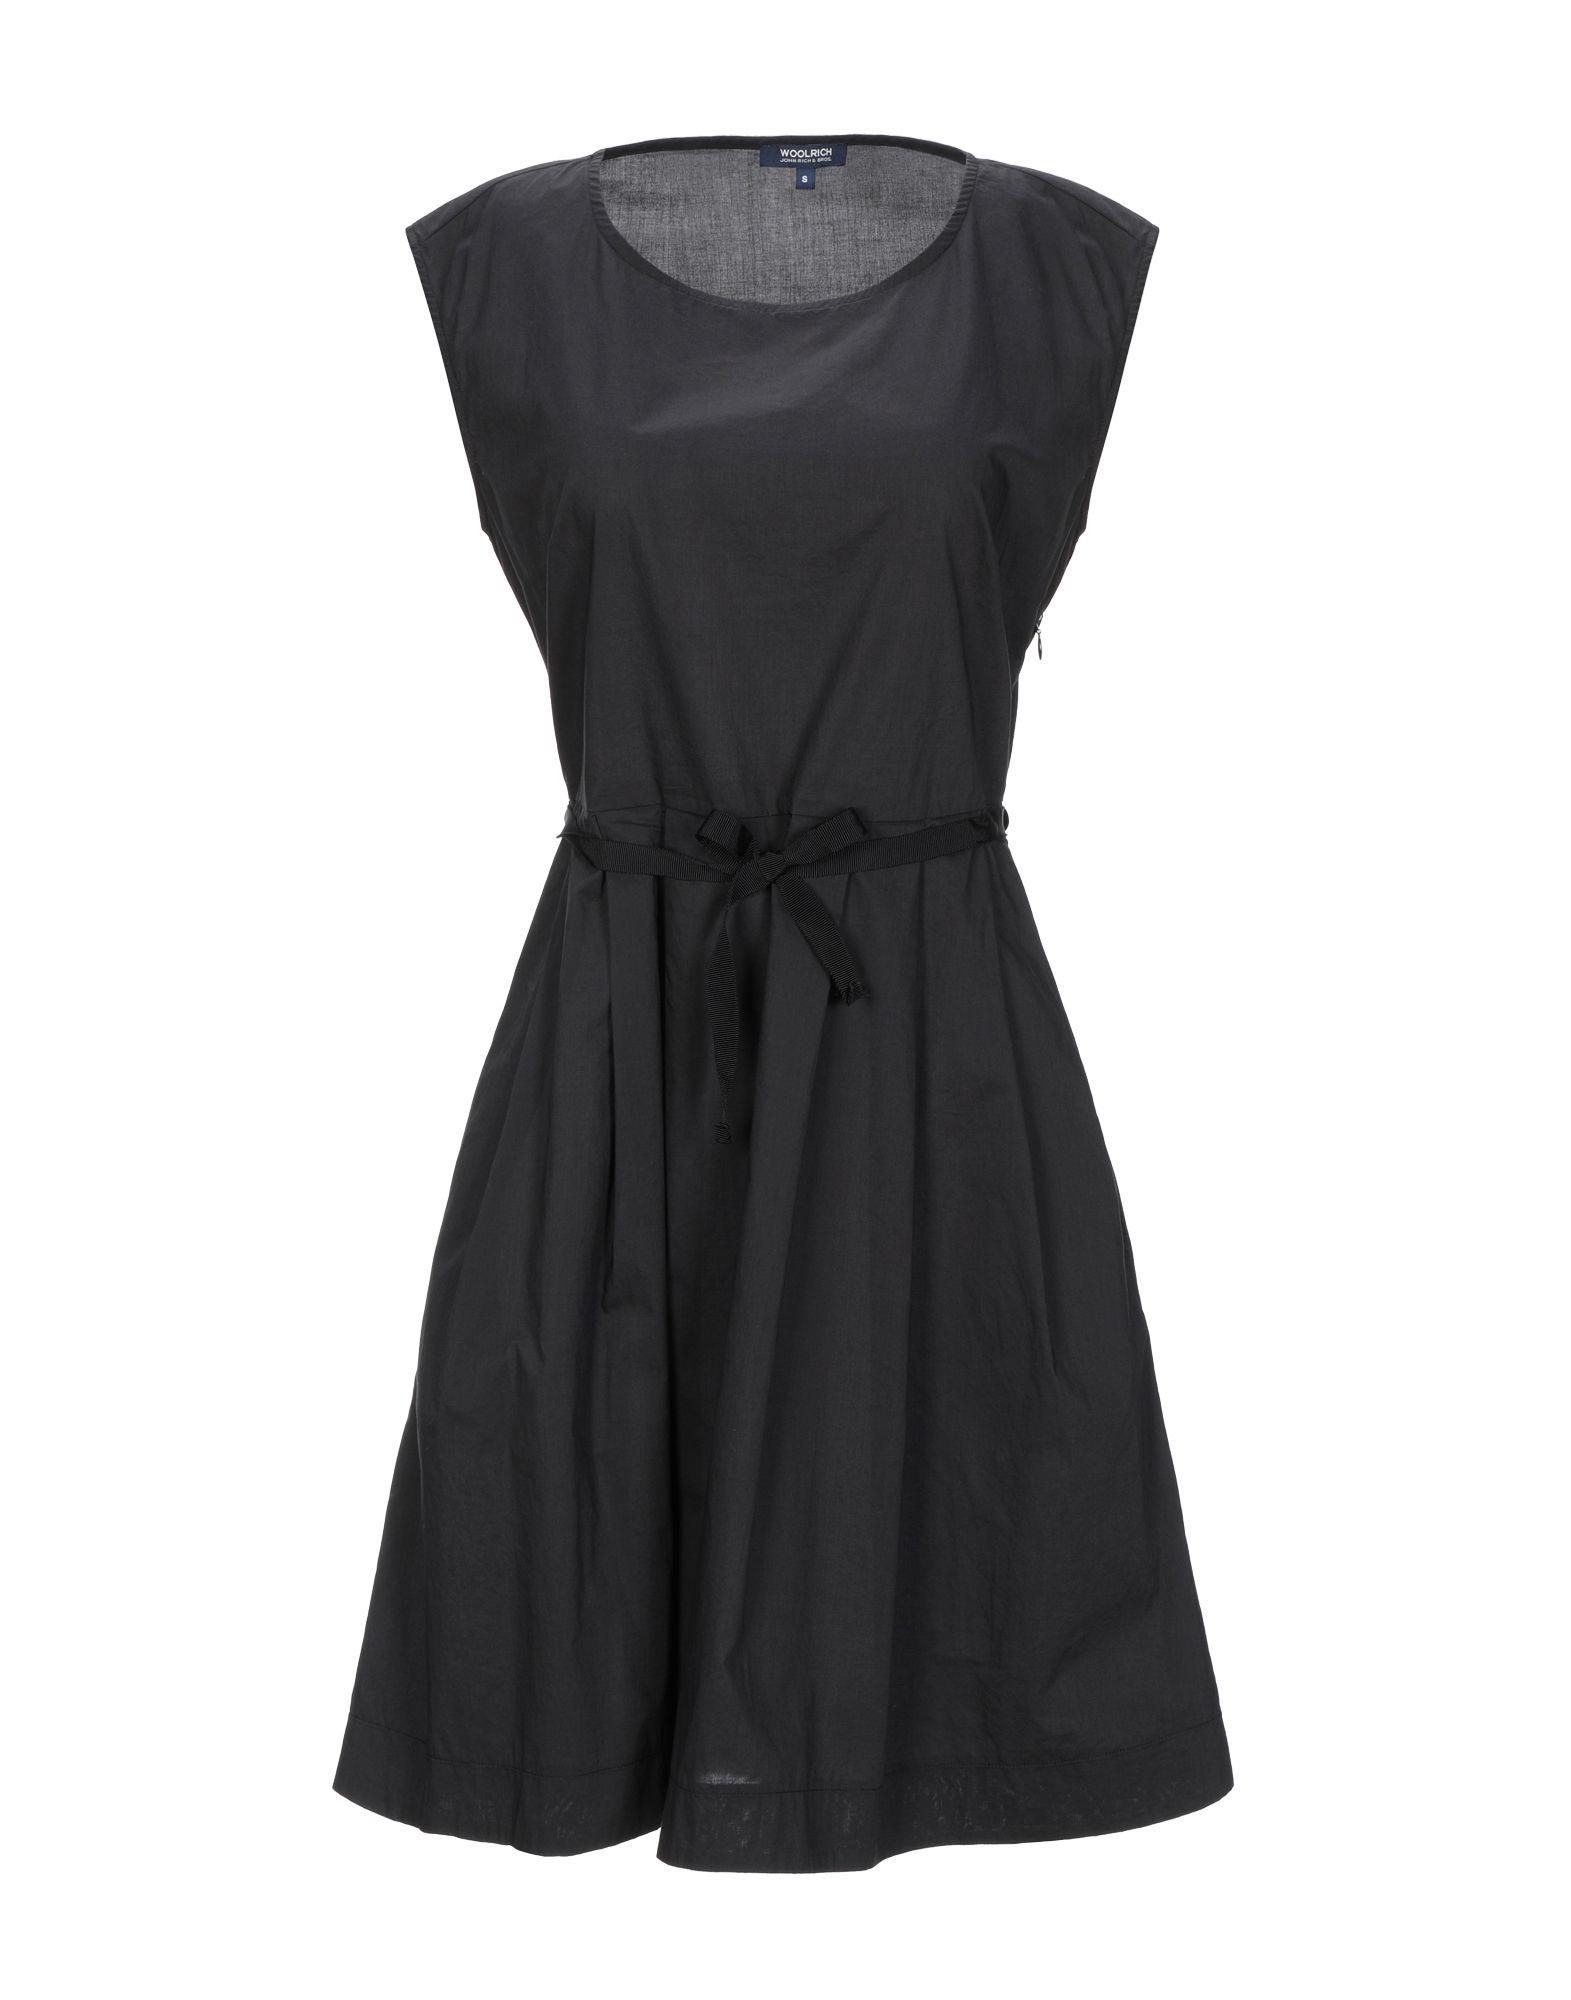 Фото - WOOLRICH Короткое платье woolrich топ без рукавов